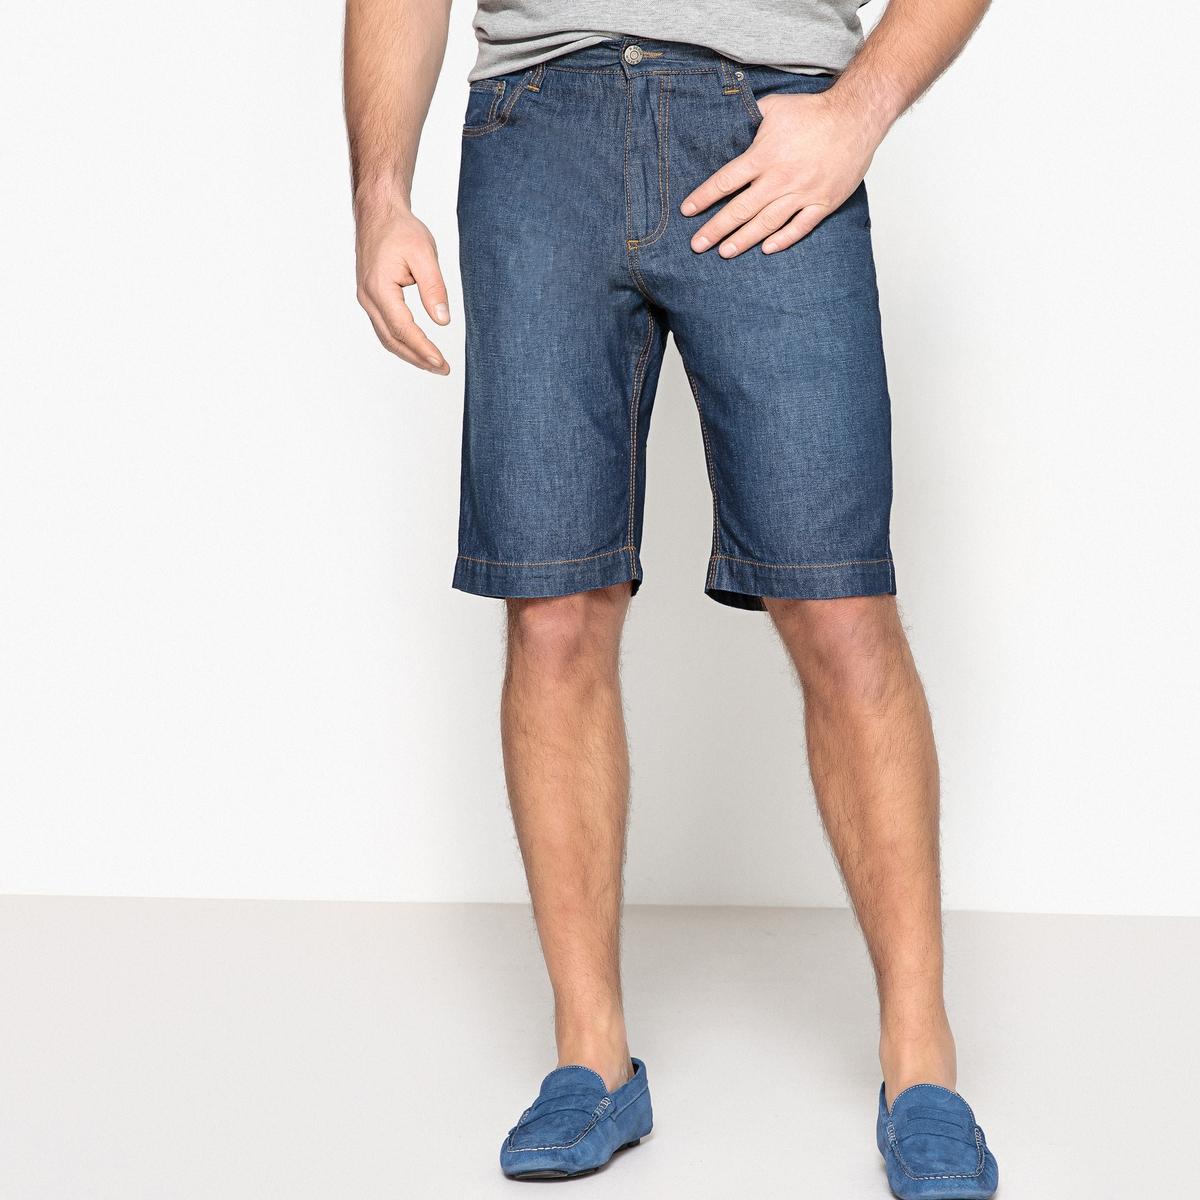 Bermuda 5 tasche cintura elasticizzata